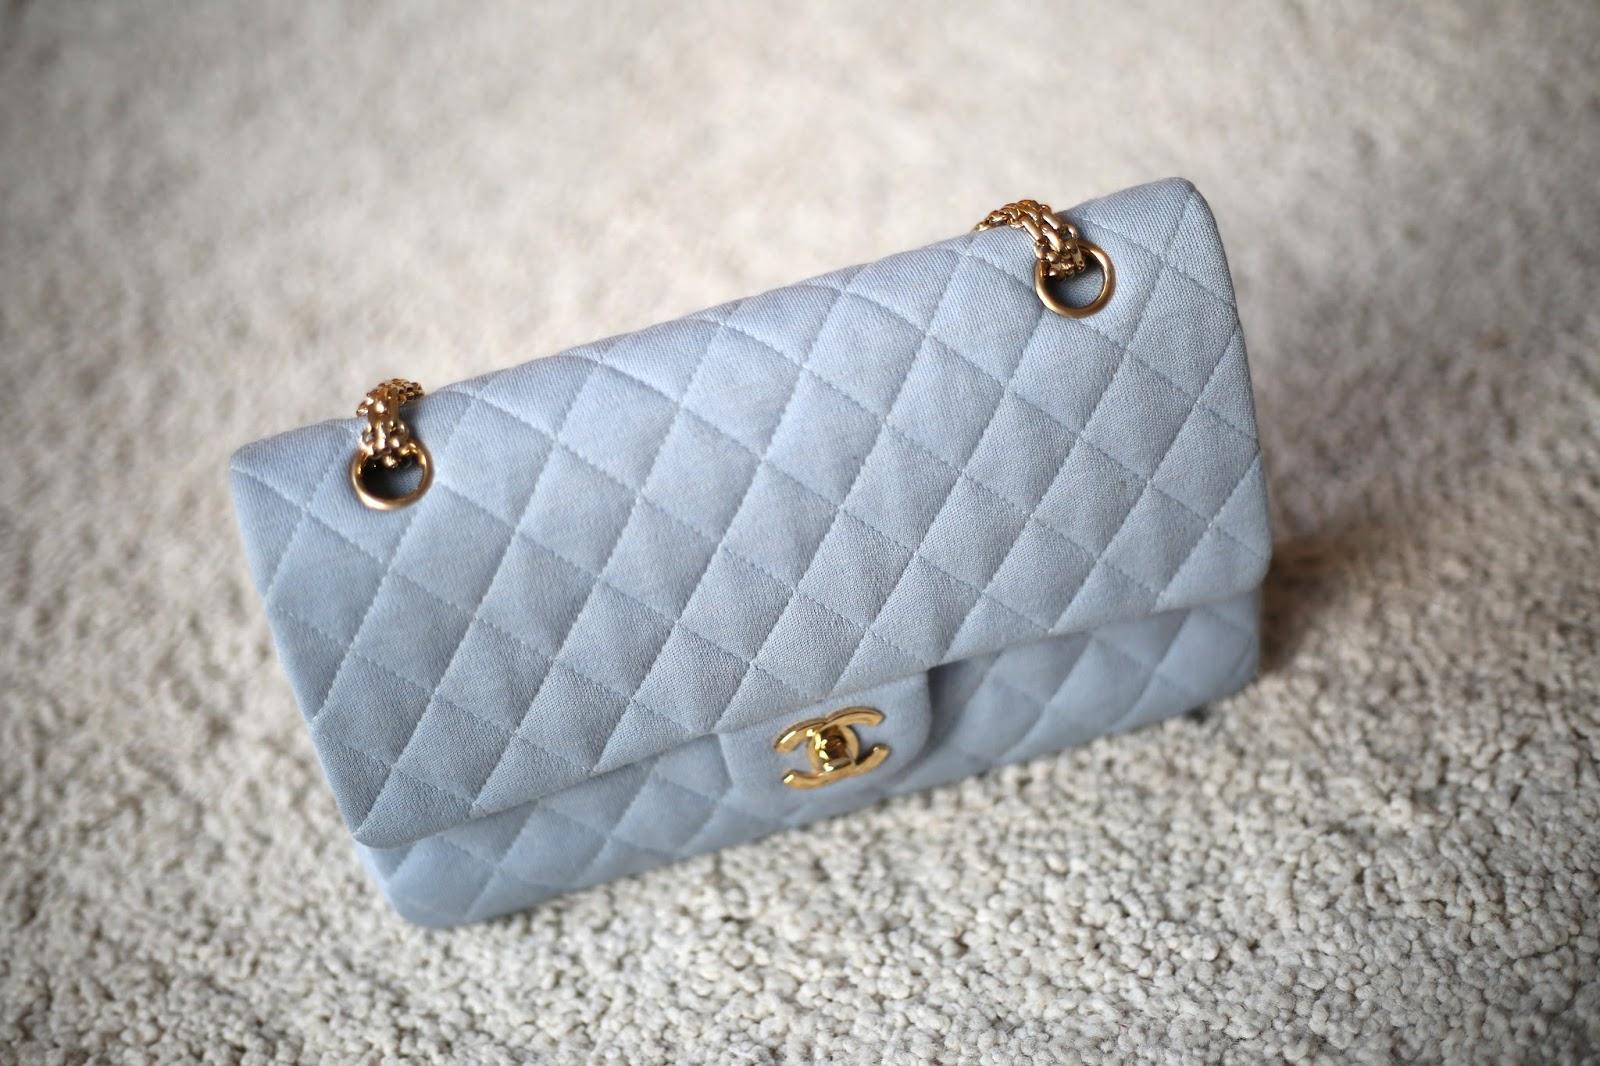 Stina s Vintage Store  Chanel 2.55 flap bag in light blue 2.55 2c4dd2a9d